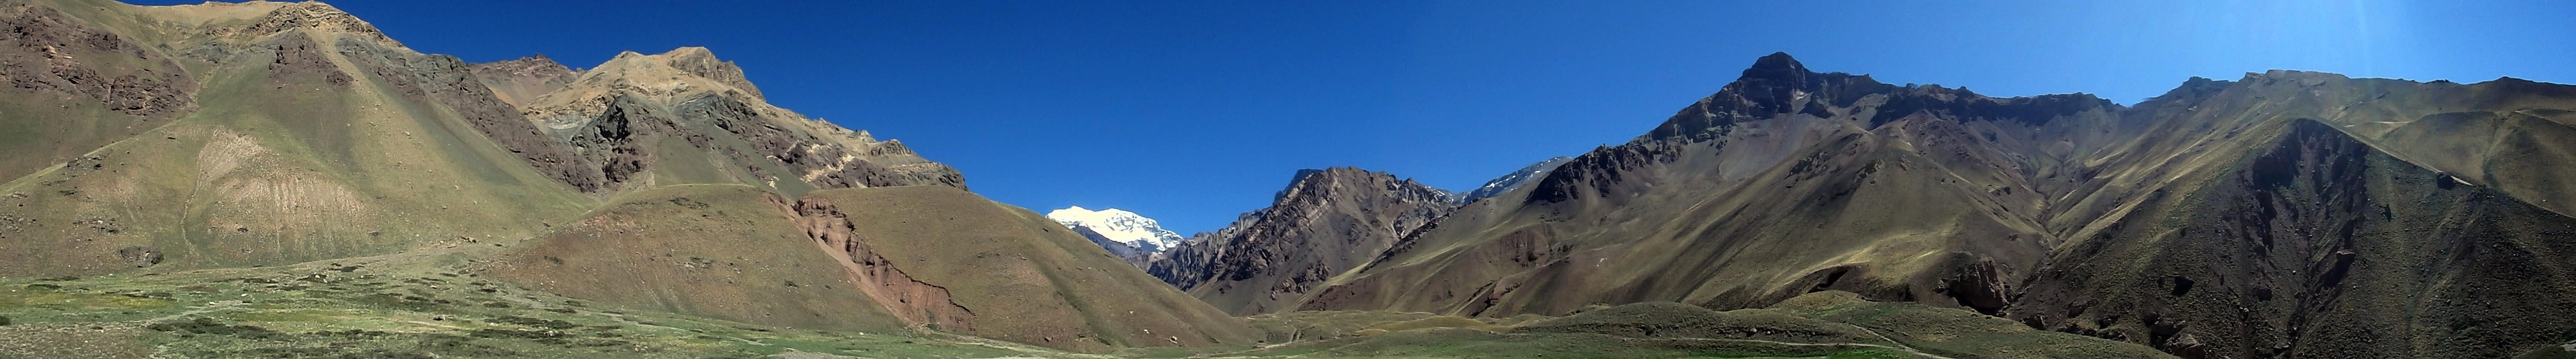 171218_Mendoza-Aconcagua102